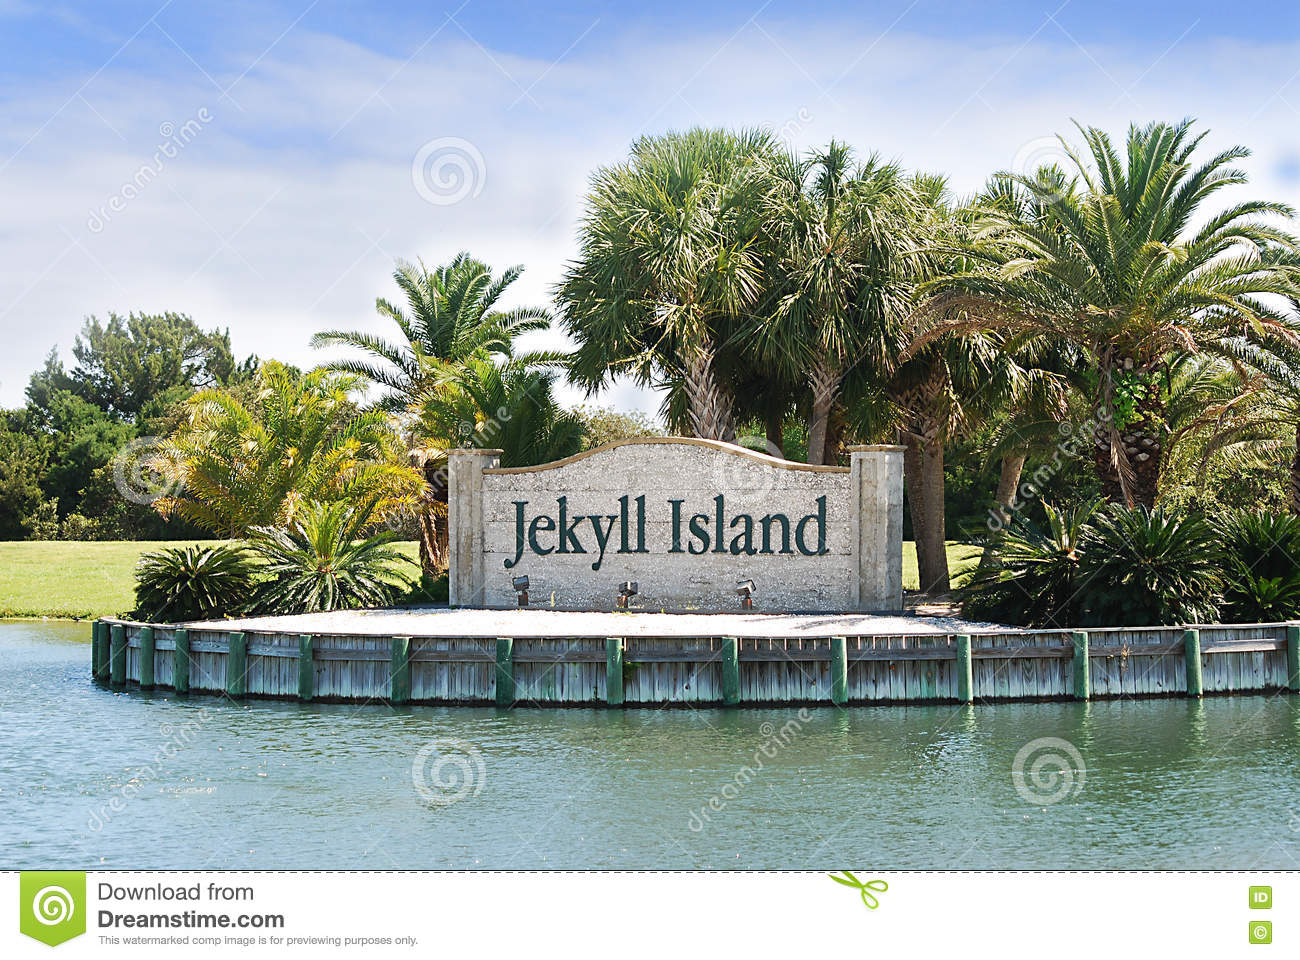 The Landmark Entrance Sign To Jekyll Island, Georgia. Stock Photo.